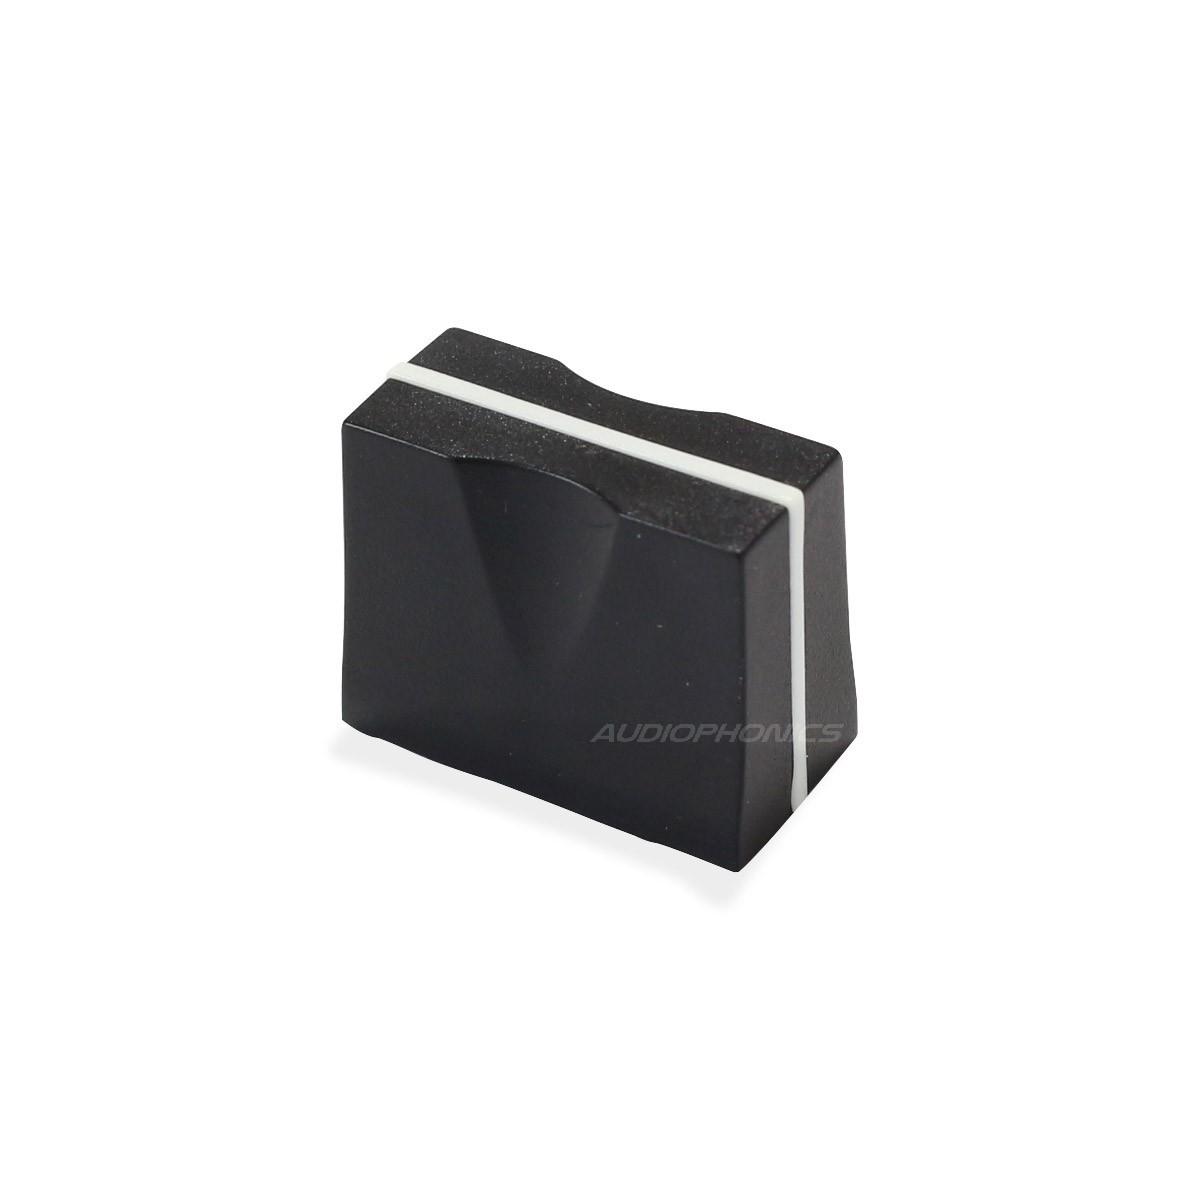 Knob for Fader Slide Potentiometer 19x10x15mm 7mm Black